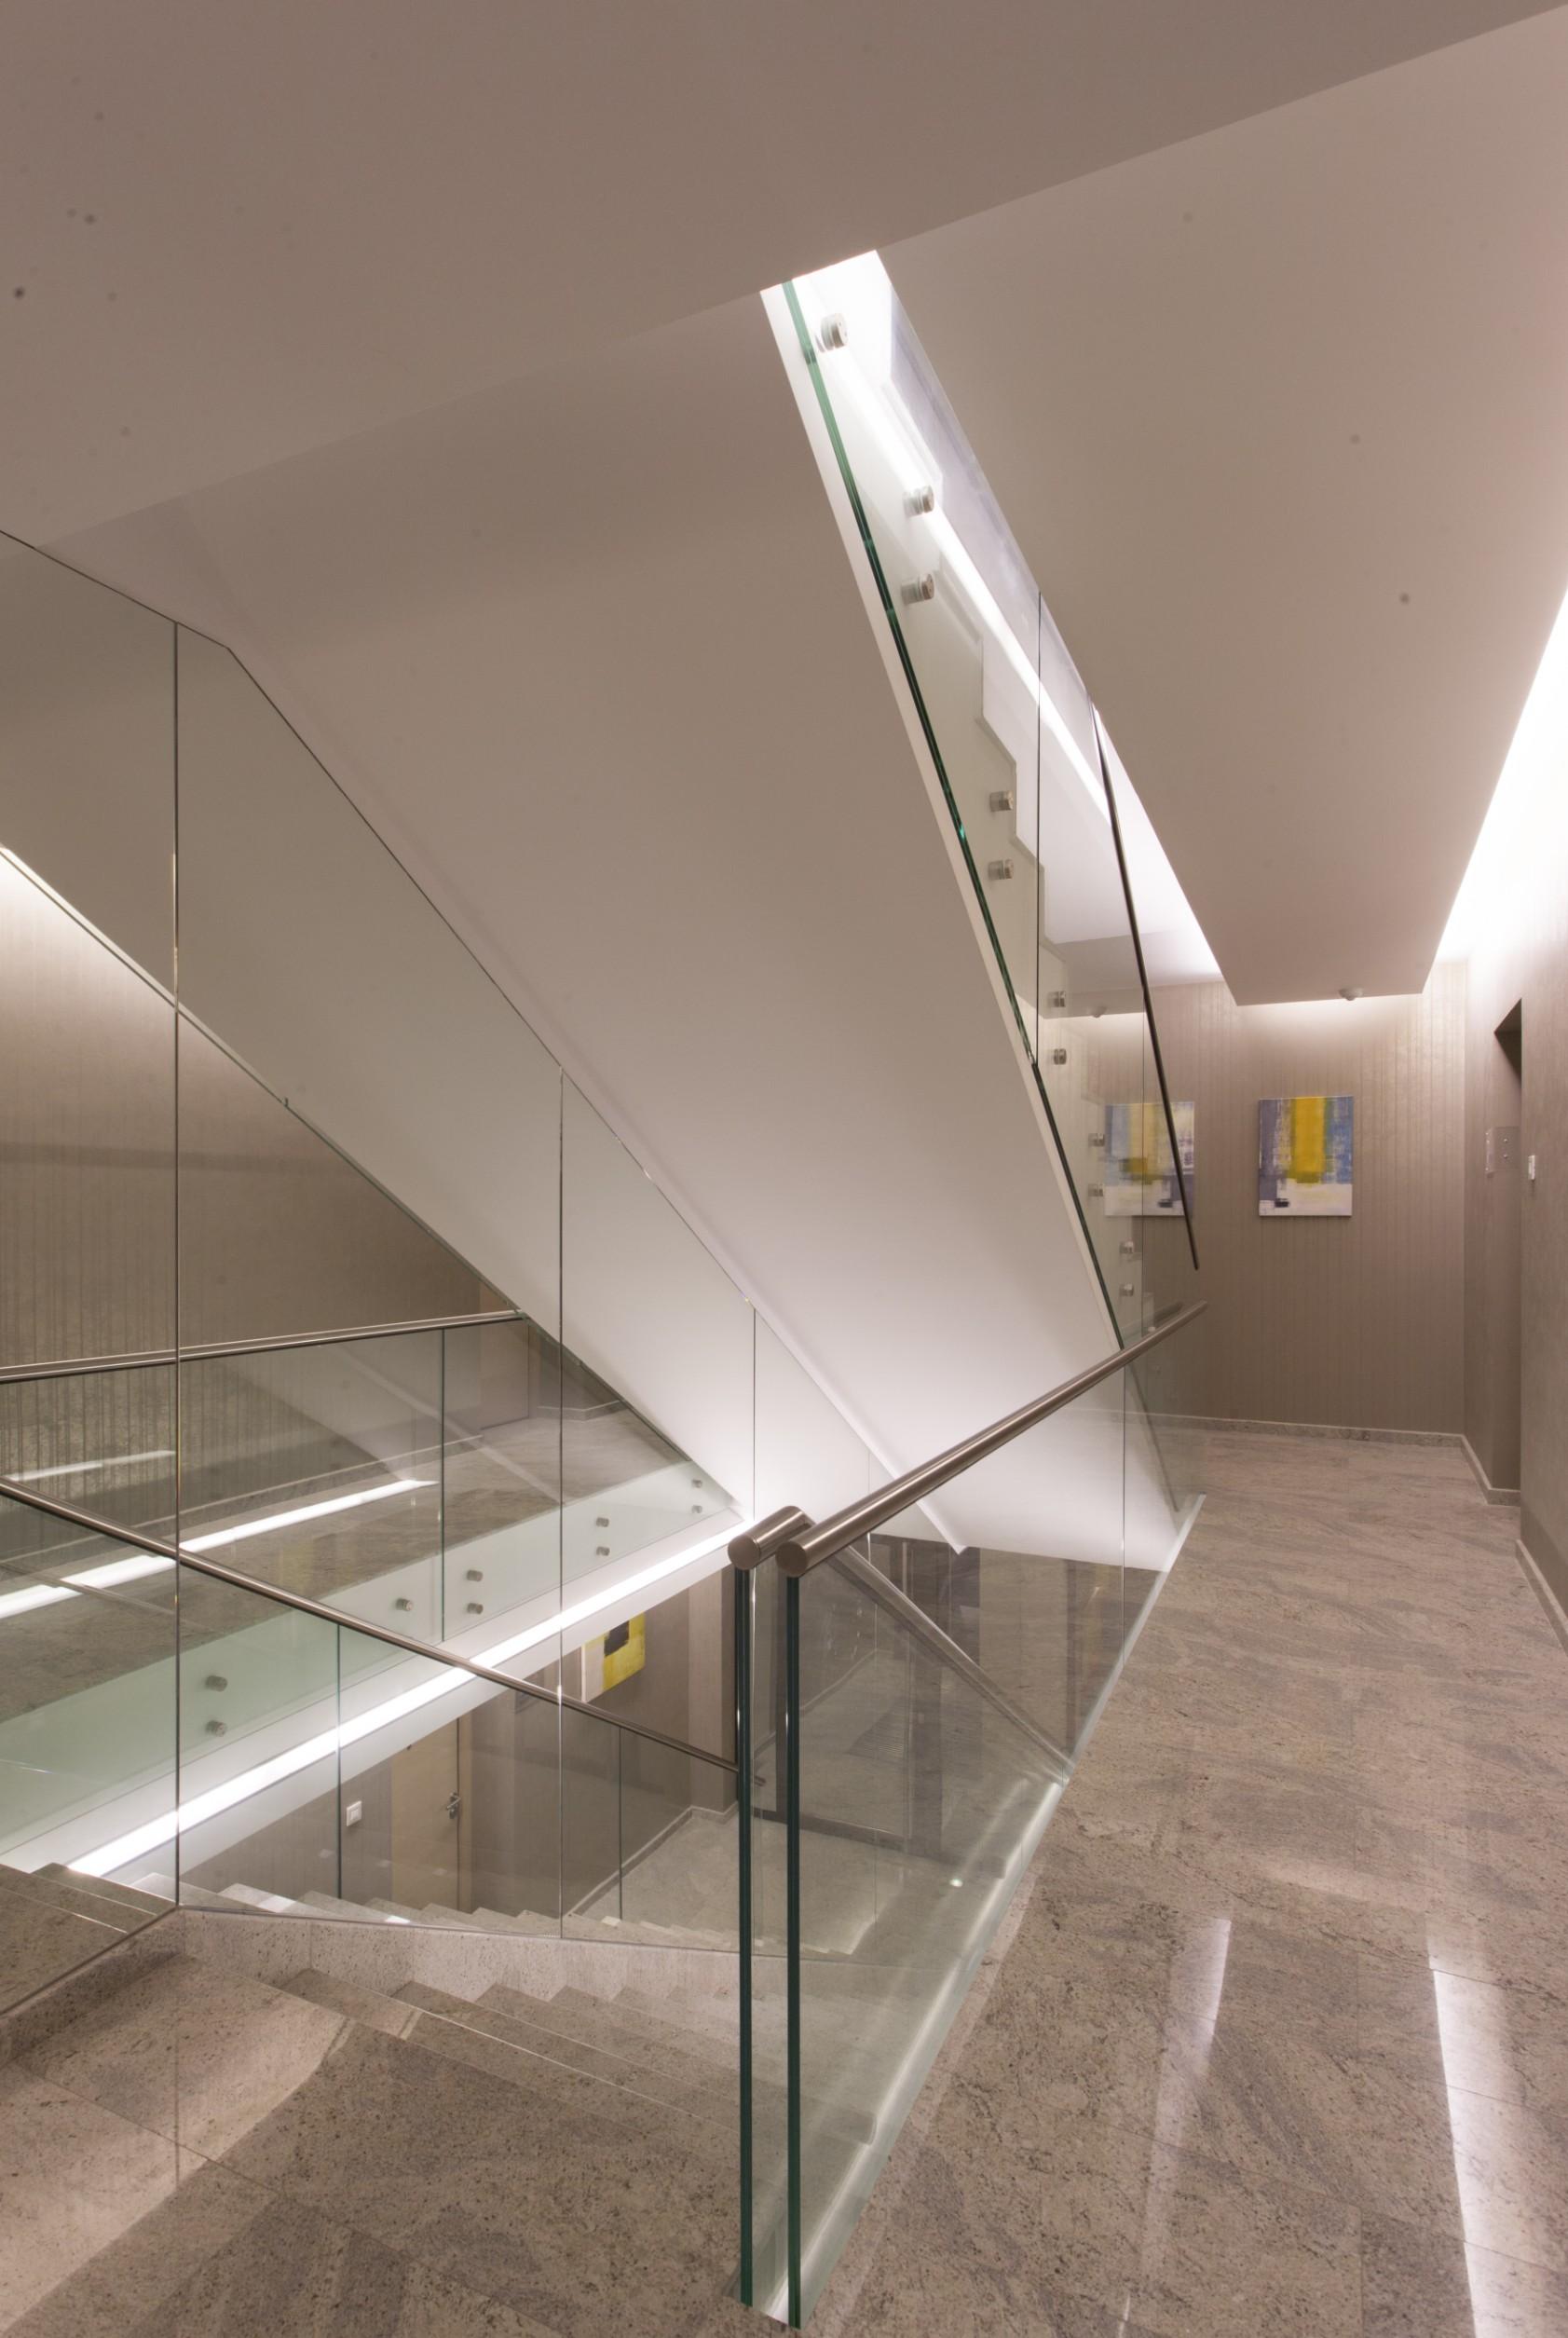 https://nbc-arhitect.ro/wp-content/uploads/2020/10/NBC-Arhitect-_-Petofi-Sandor-_-Housing-_-interior-design_stairs_3.jpg